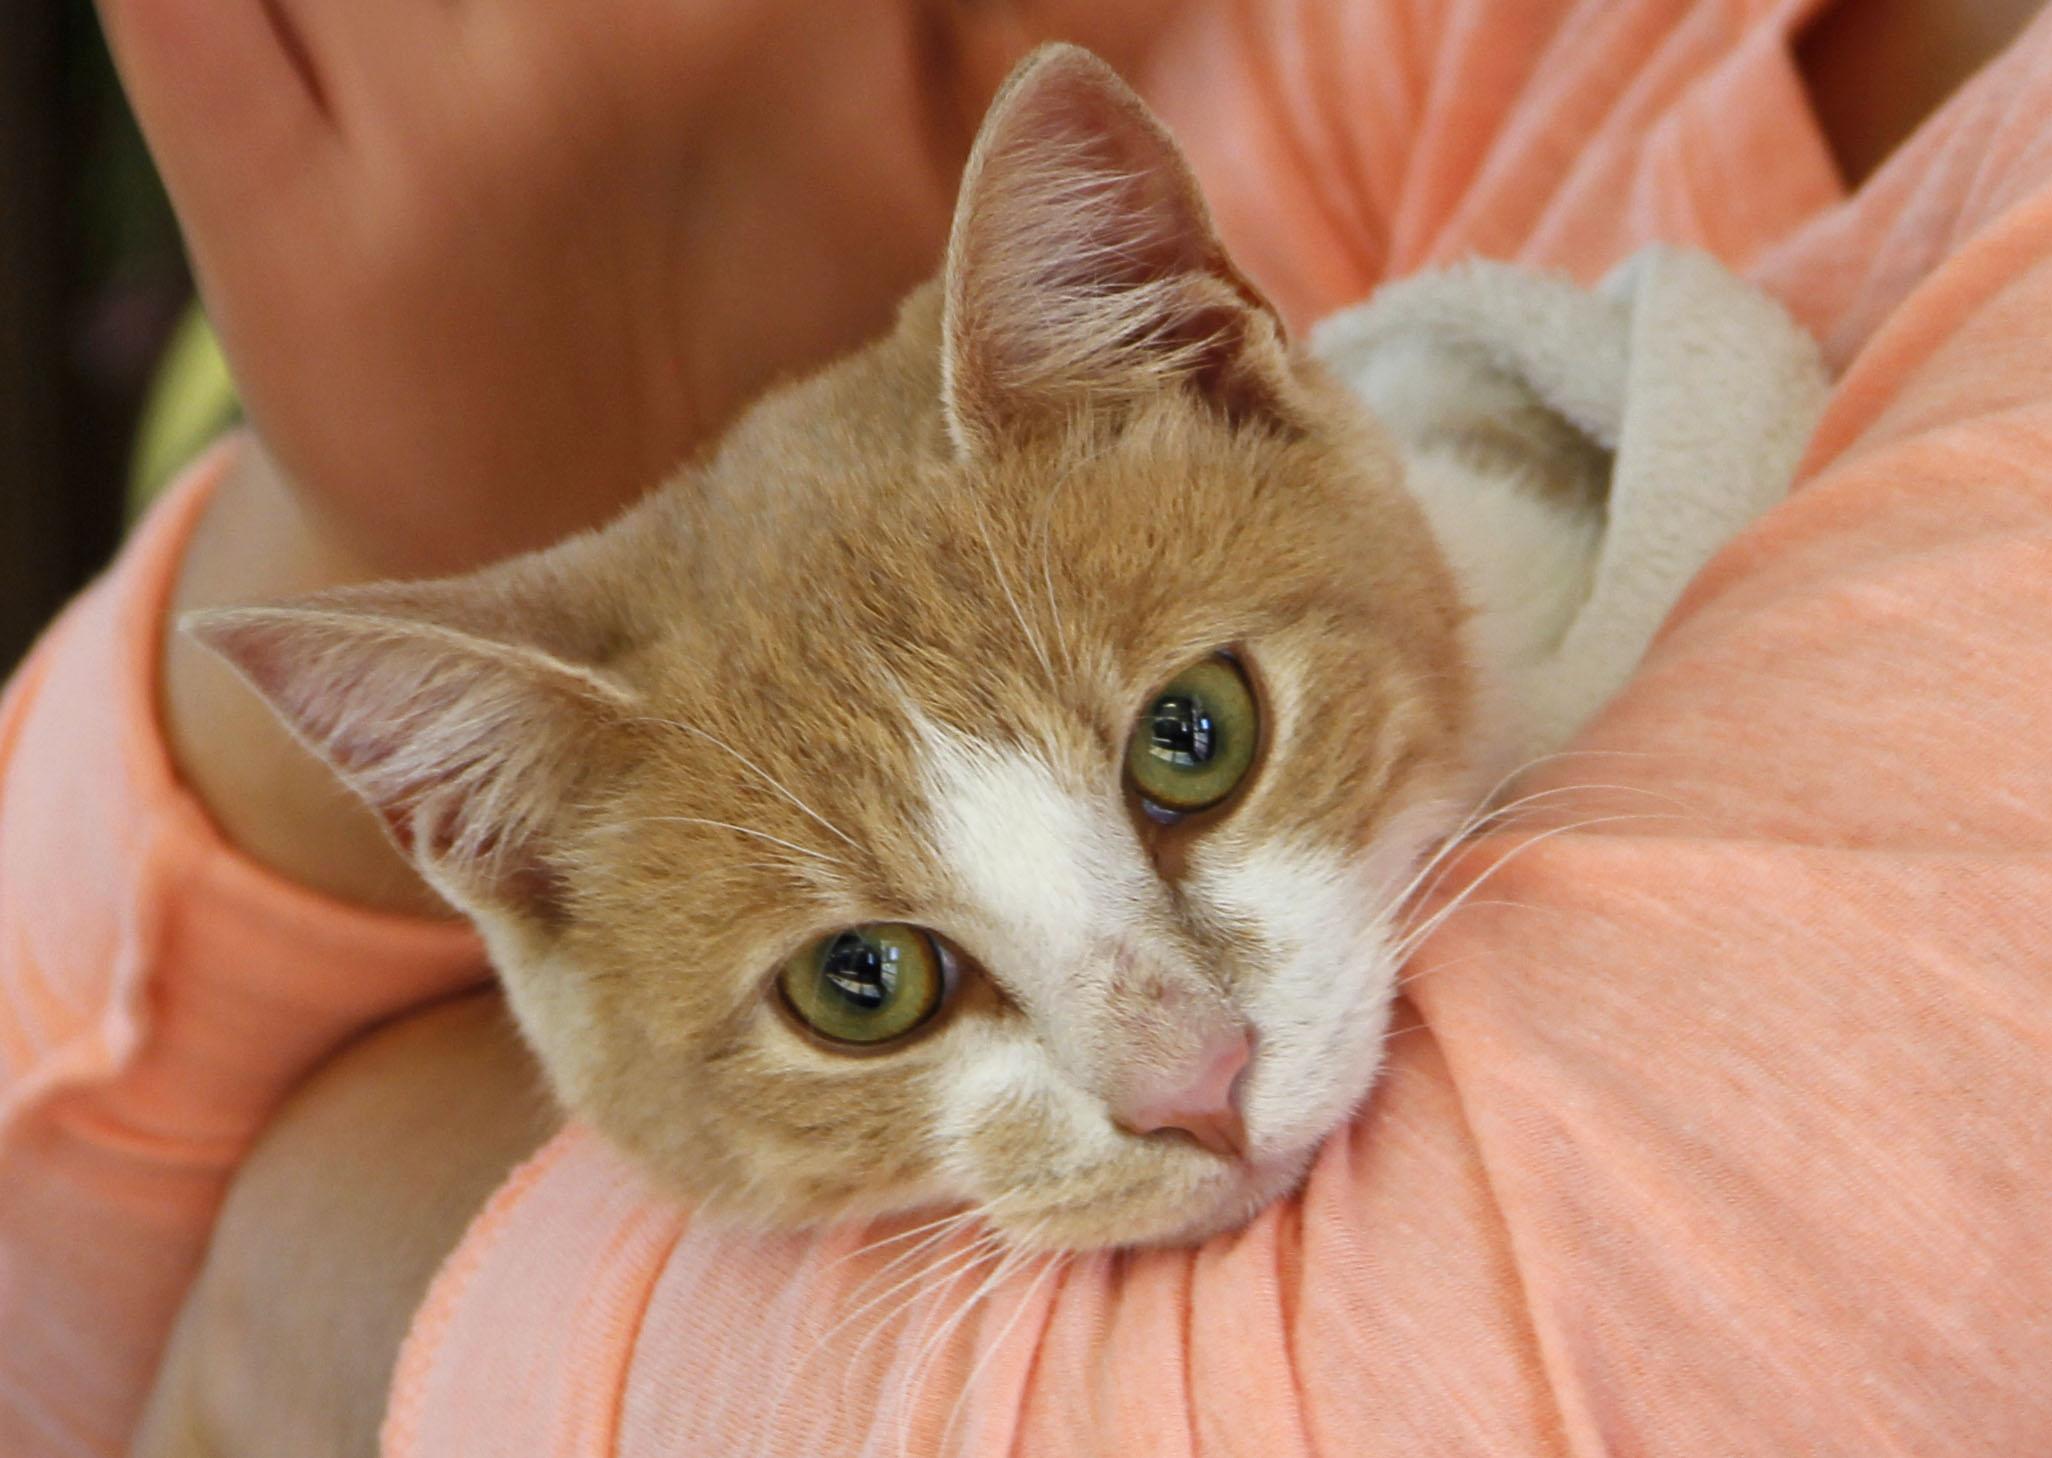 Gato dorado - 2052x1458